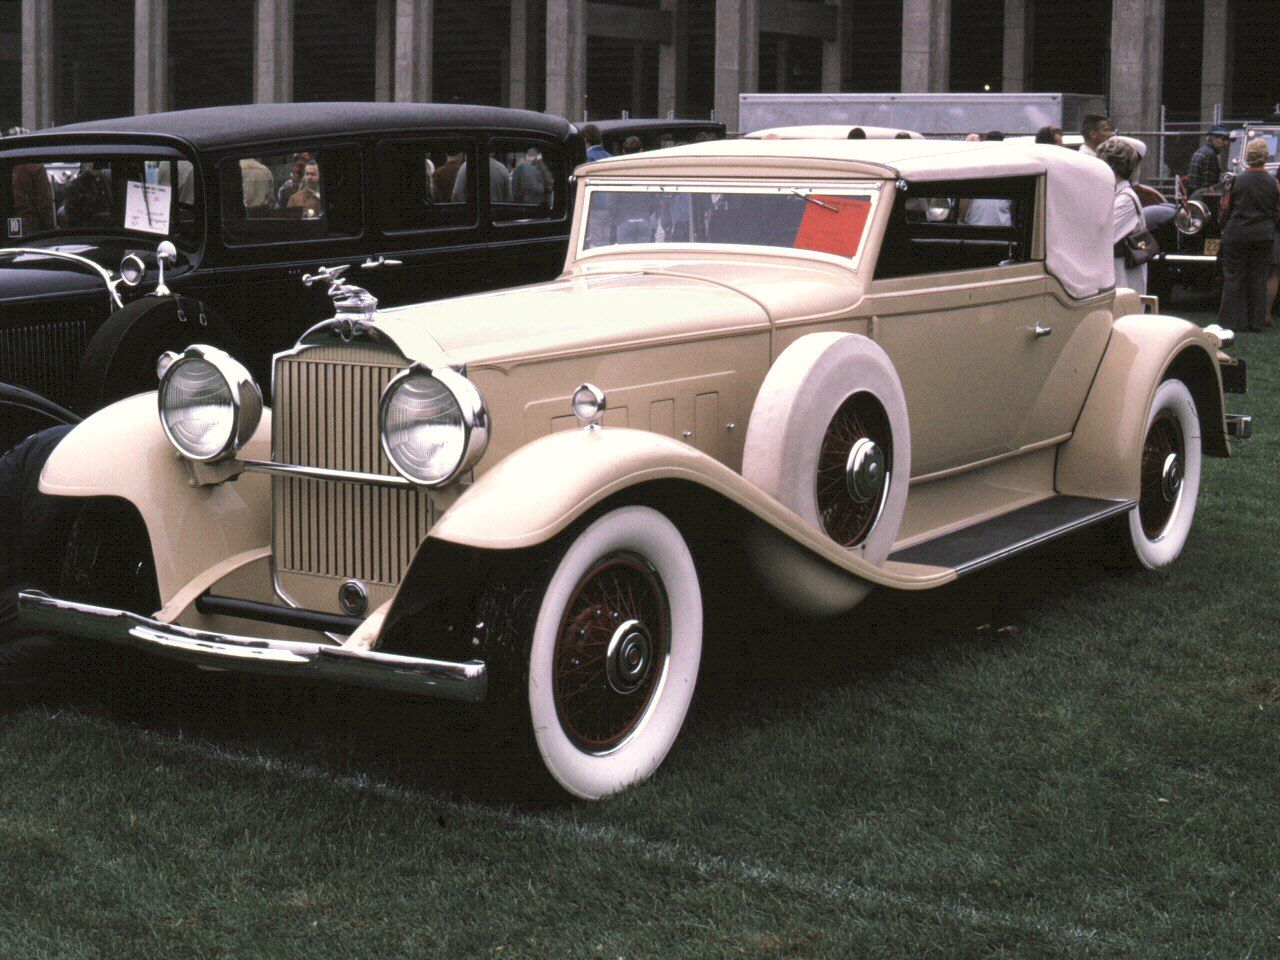 Untitled : Photo   Vintage Autos through the 1940s   Pinterest ...